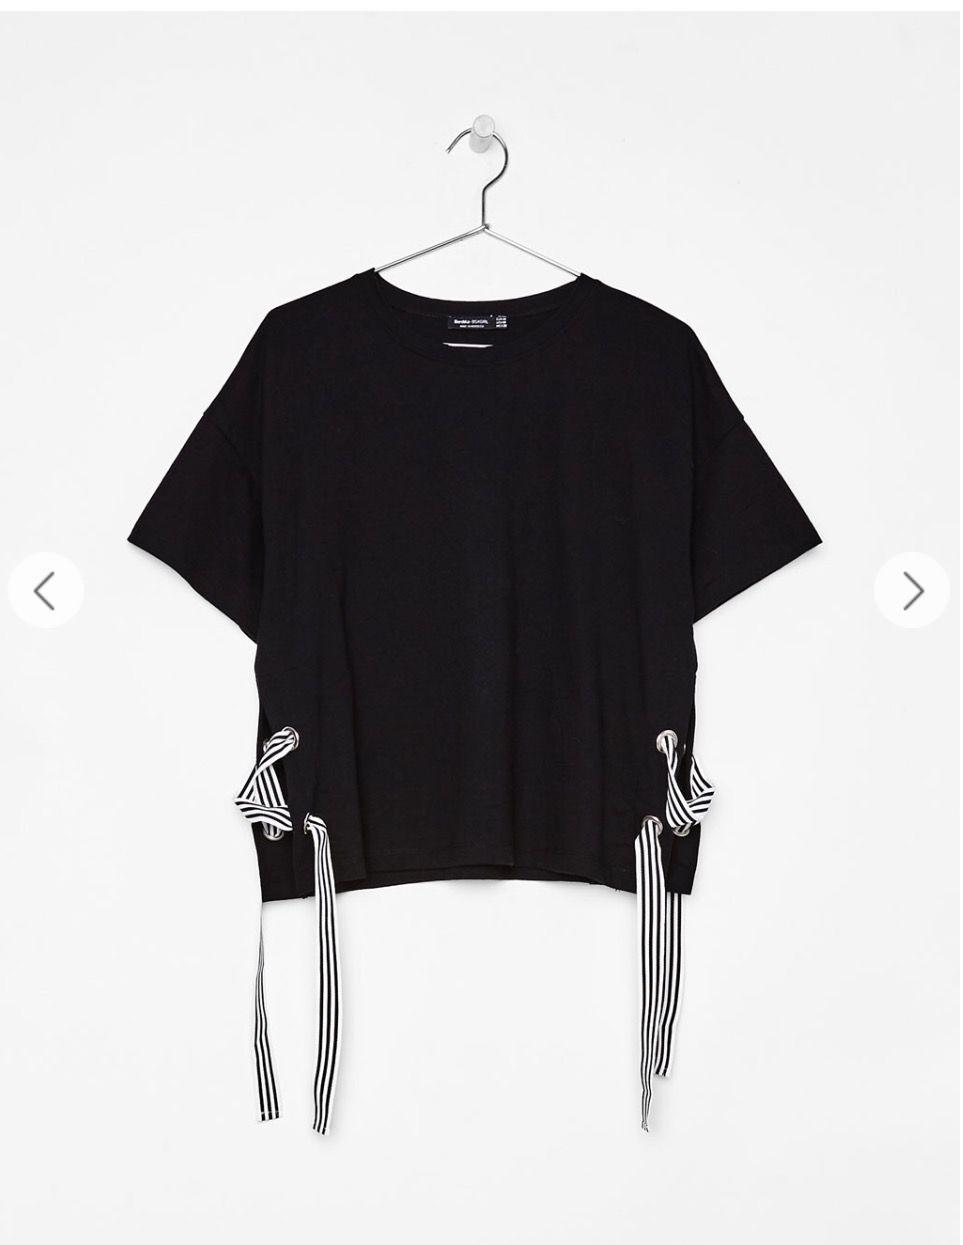 Camiseta negra lazada - Bershka